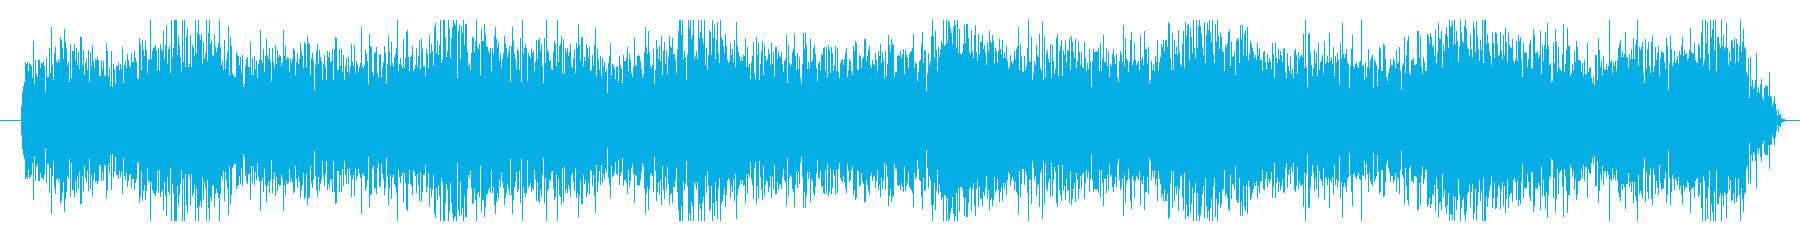 FI スペース 宇宙船フライング02の再生済みの波形